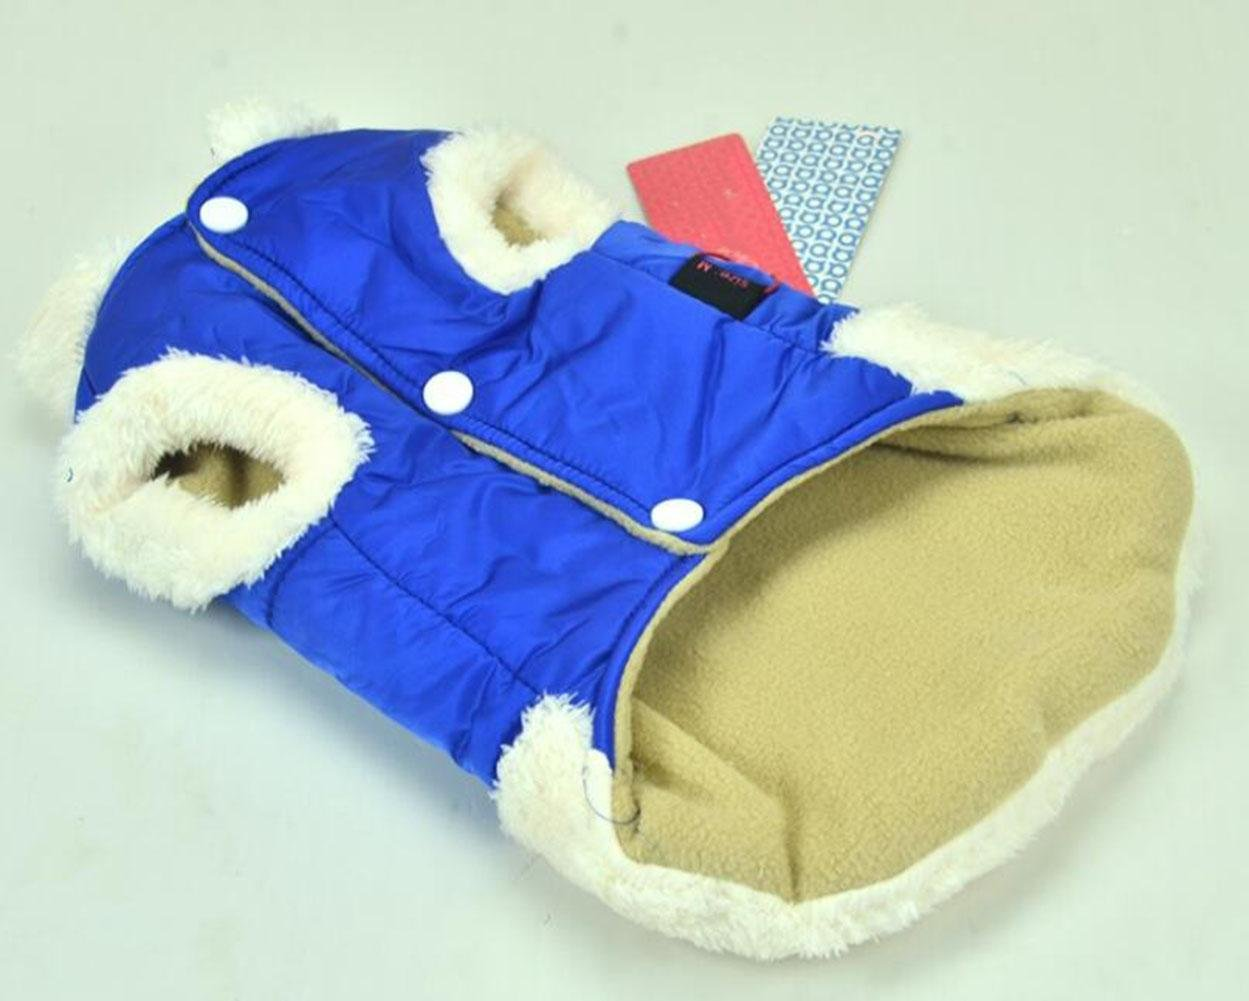 blueEXL CHWYFX Winter Warm Pet Jackets Coats for Small Medium Dogs Red bluee Green Yellow